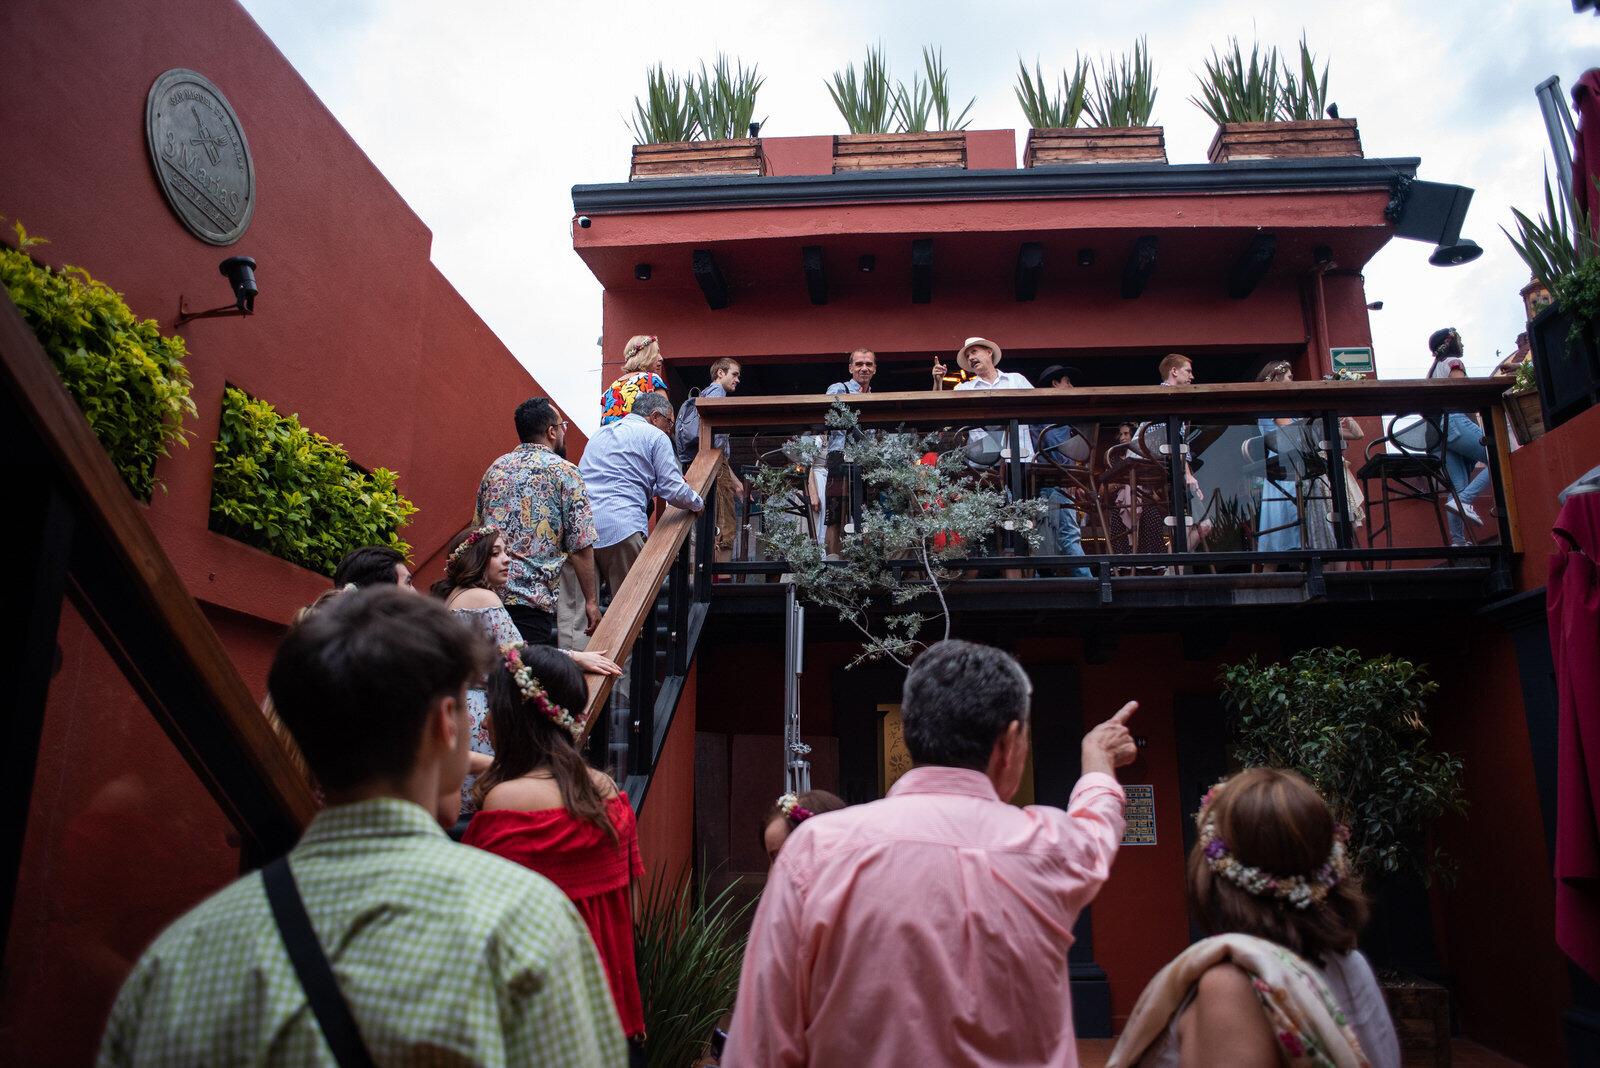 callejoneada_san_miguel_de_allende_wedding_photography_ (16).jpg